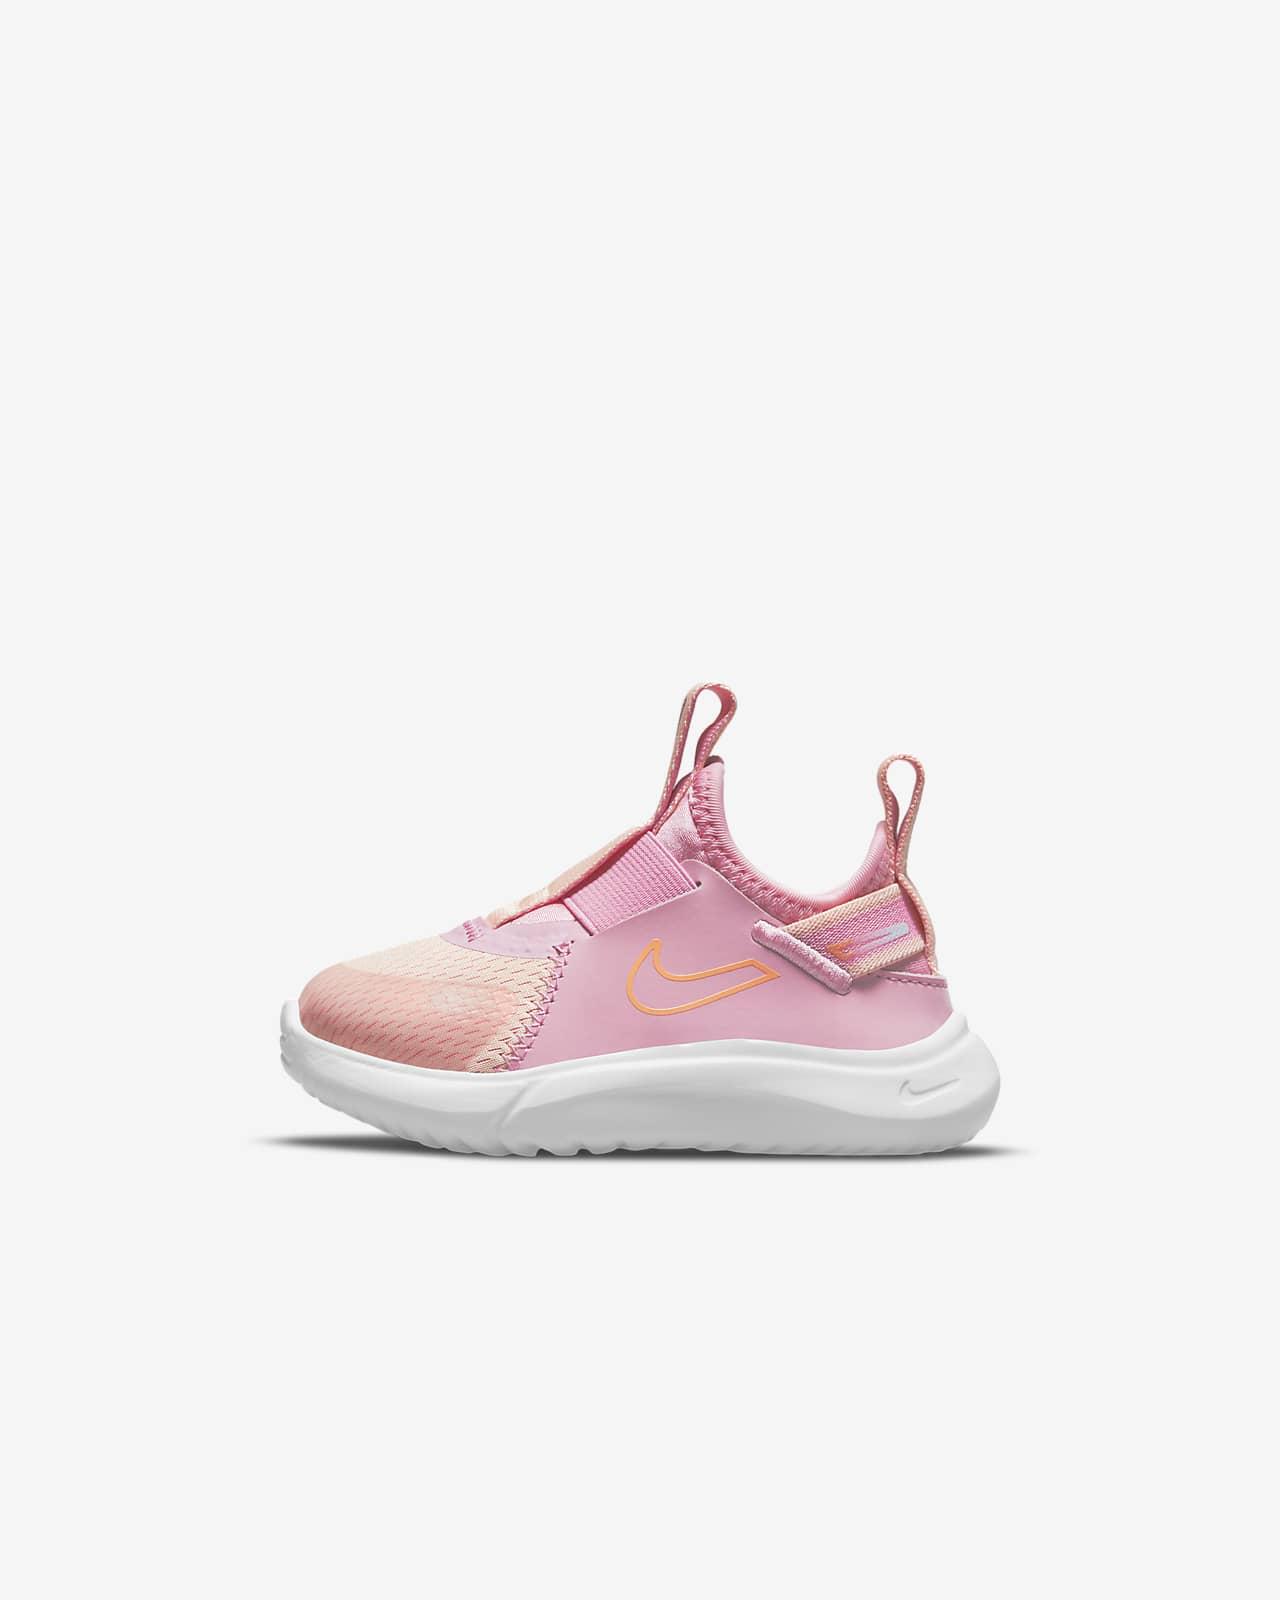 Nike Flex Plus SE Baby/Toddler Shoes